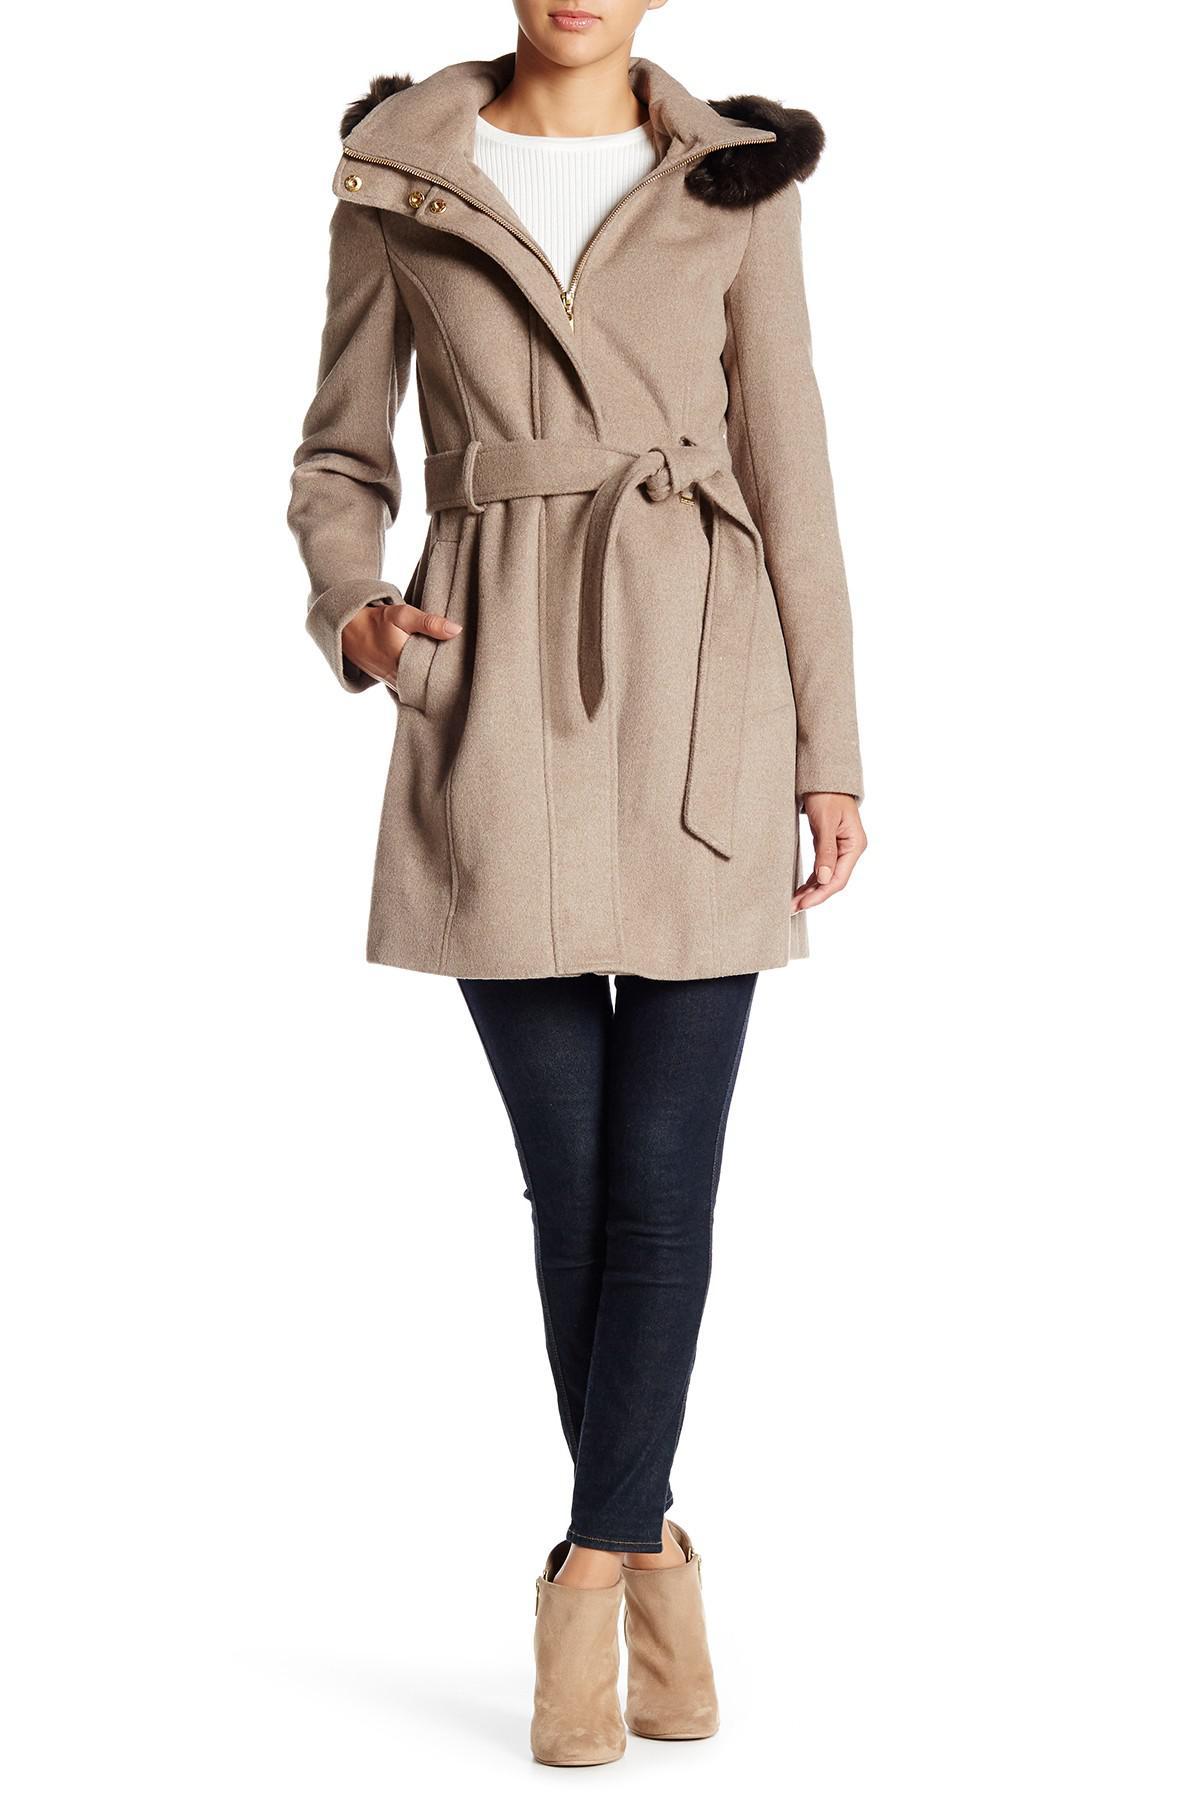 dd03d7831d1 Lyst - Ellen Tracy Faux Fur Hood Wool Blend Coat in Natural